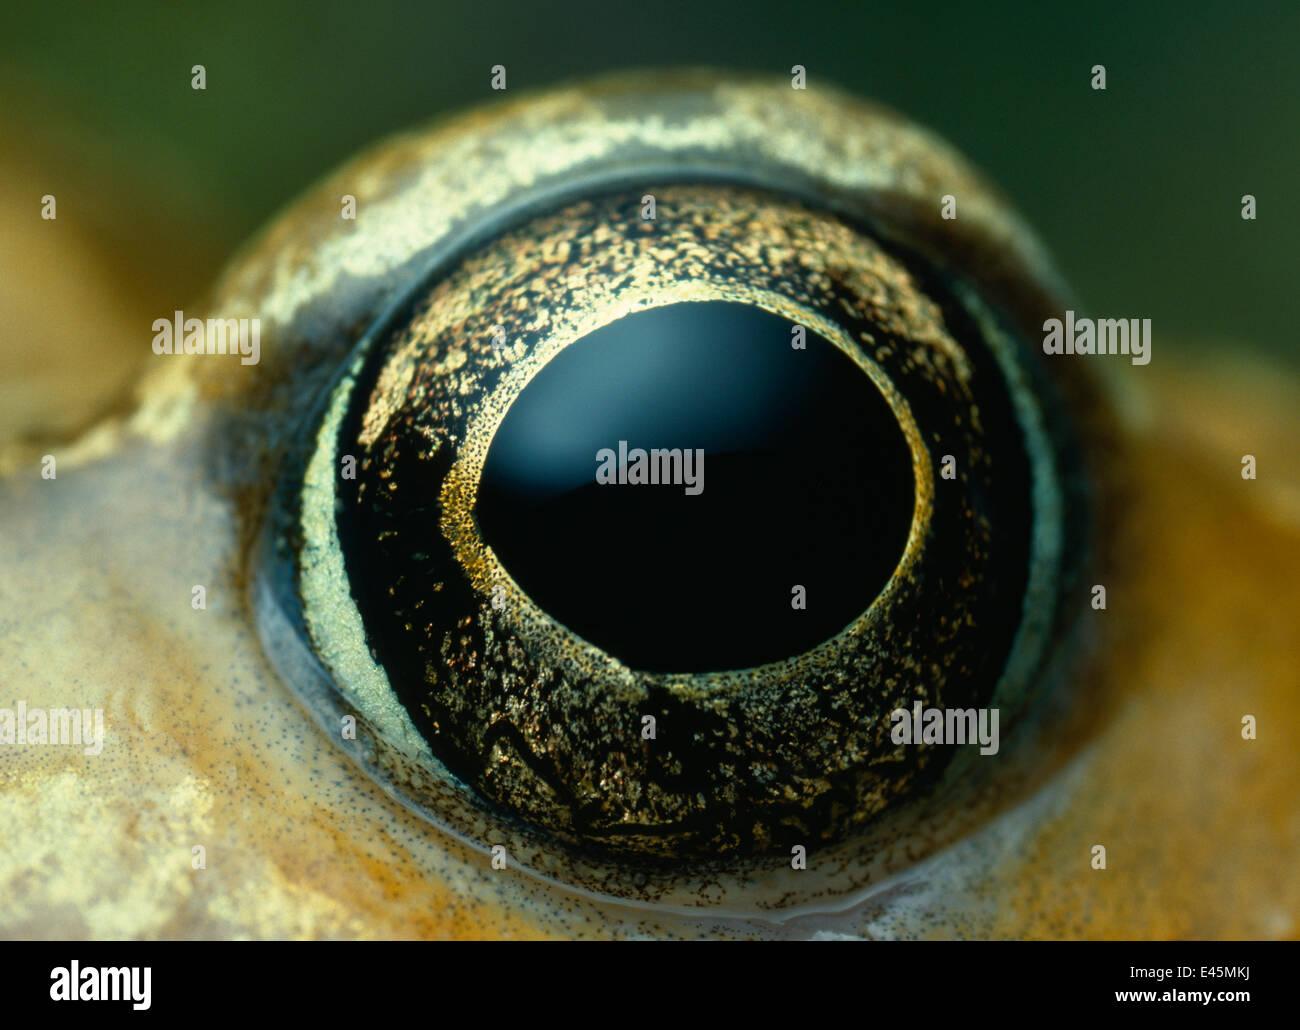 Common frog (Rana temporaria) close-up of eye - Stock Image